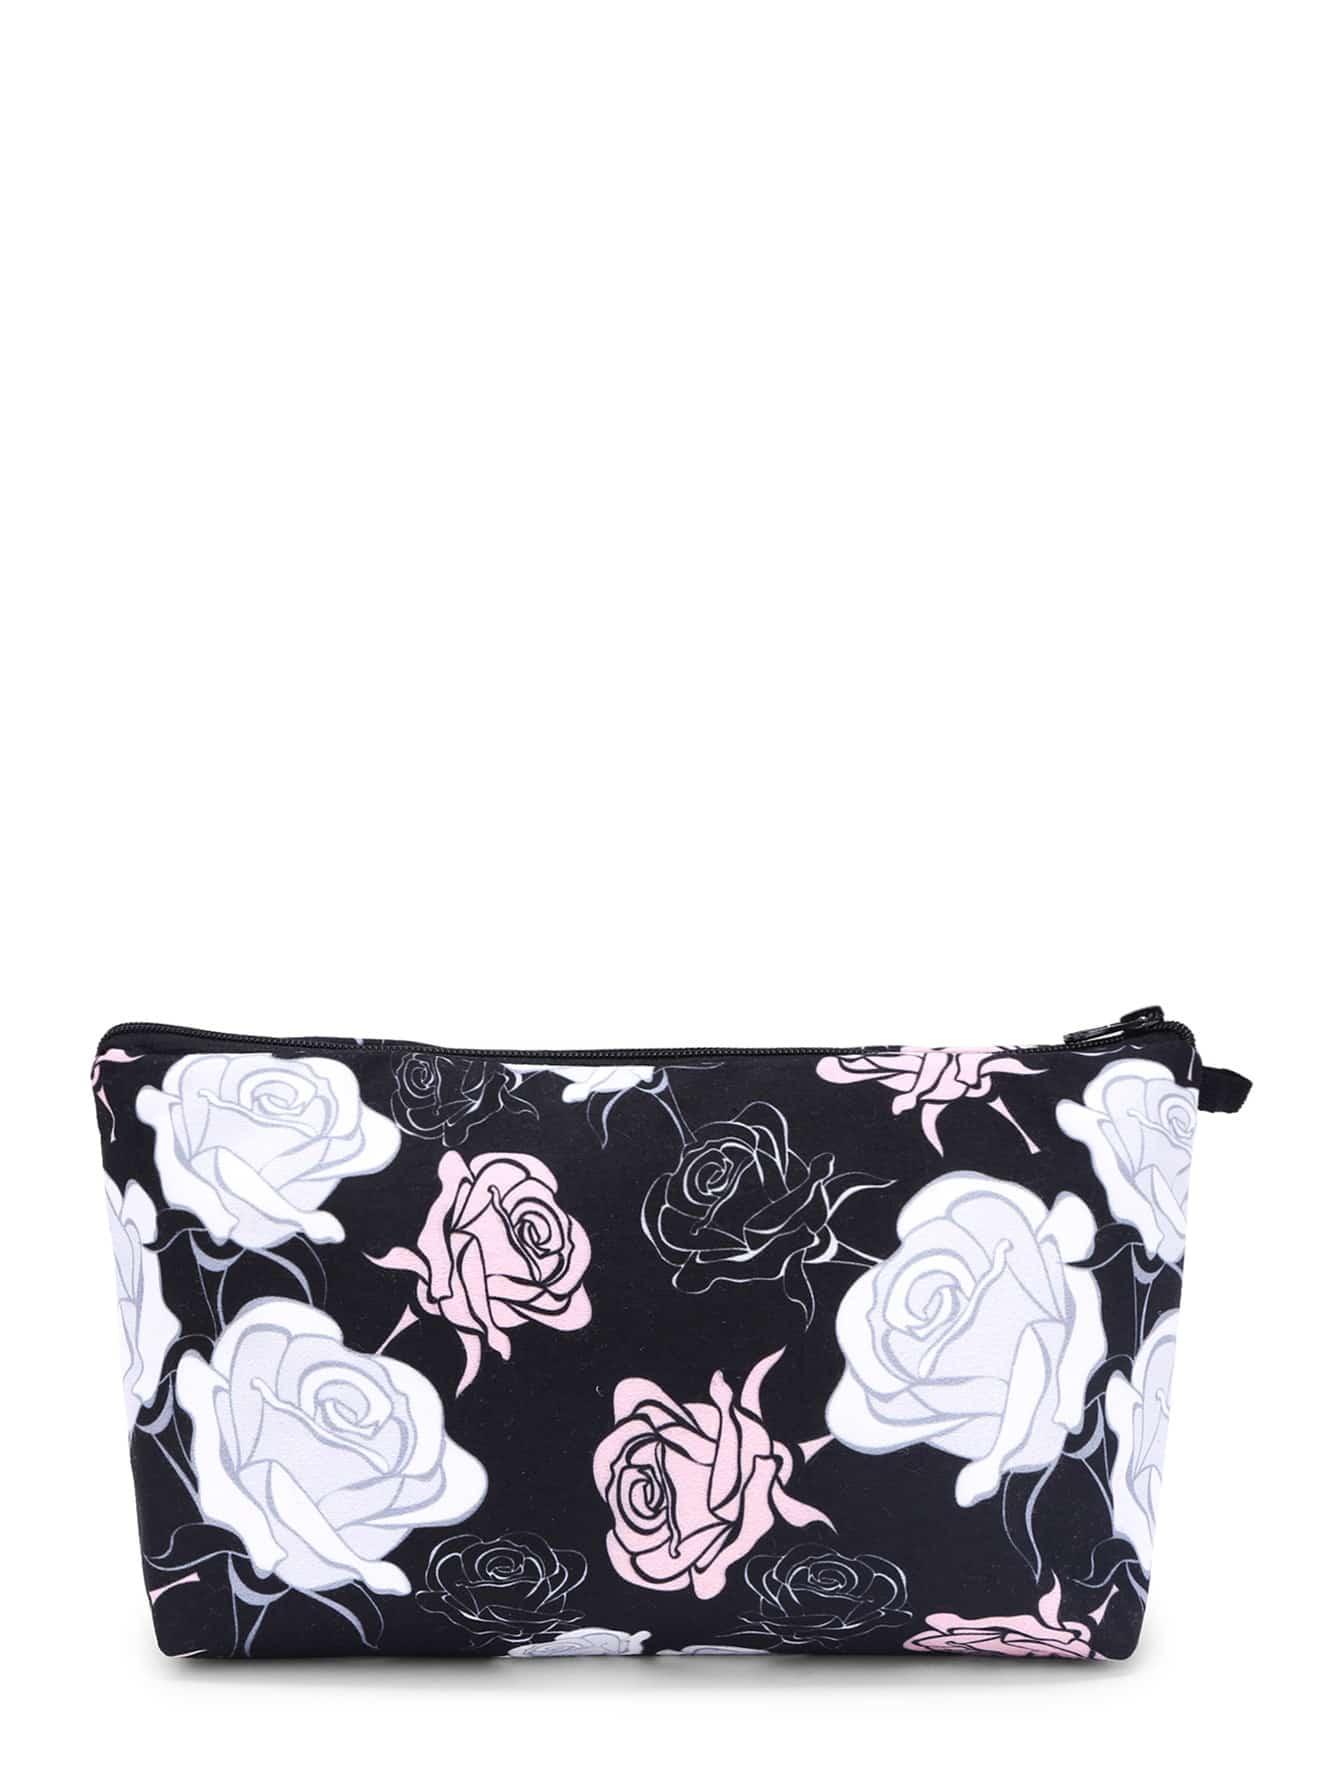 Rose Print Makeup Bag